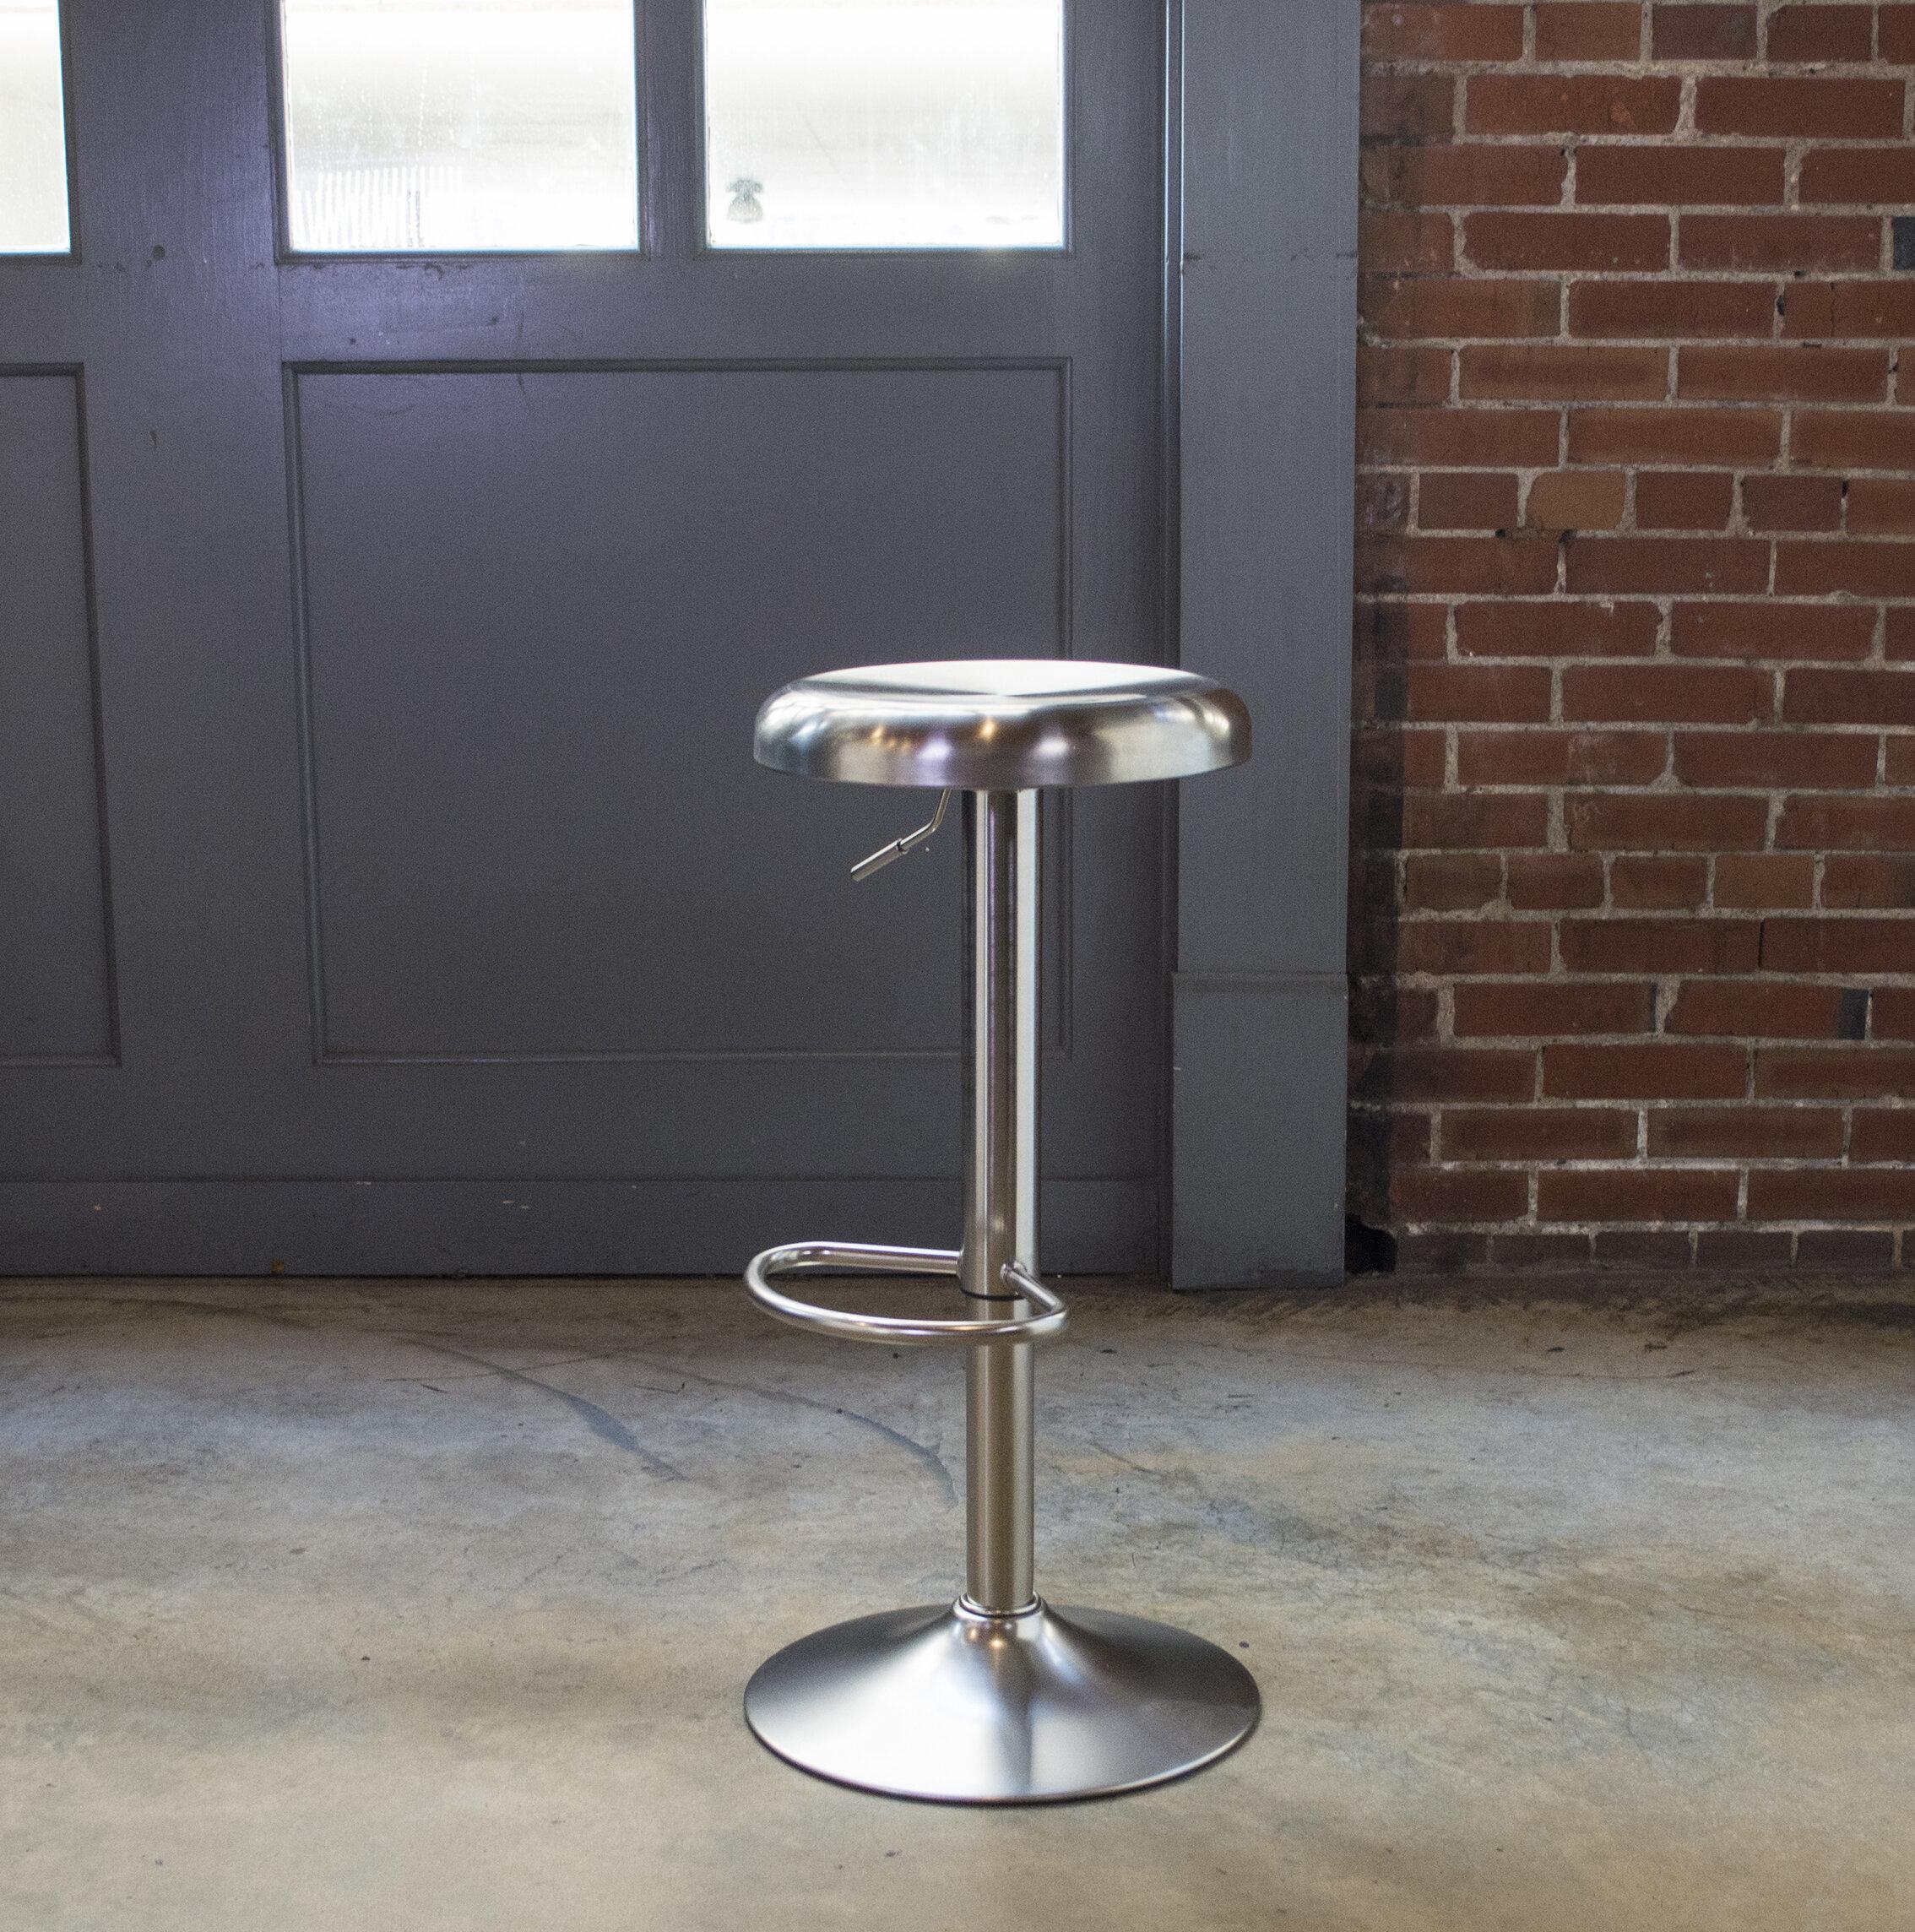 Williston Forge Winon Swivel Adjustable Height Bar Stool Reviews Wayfair